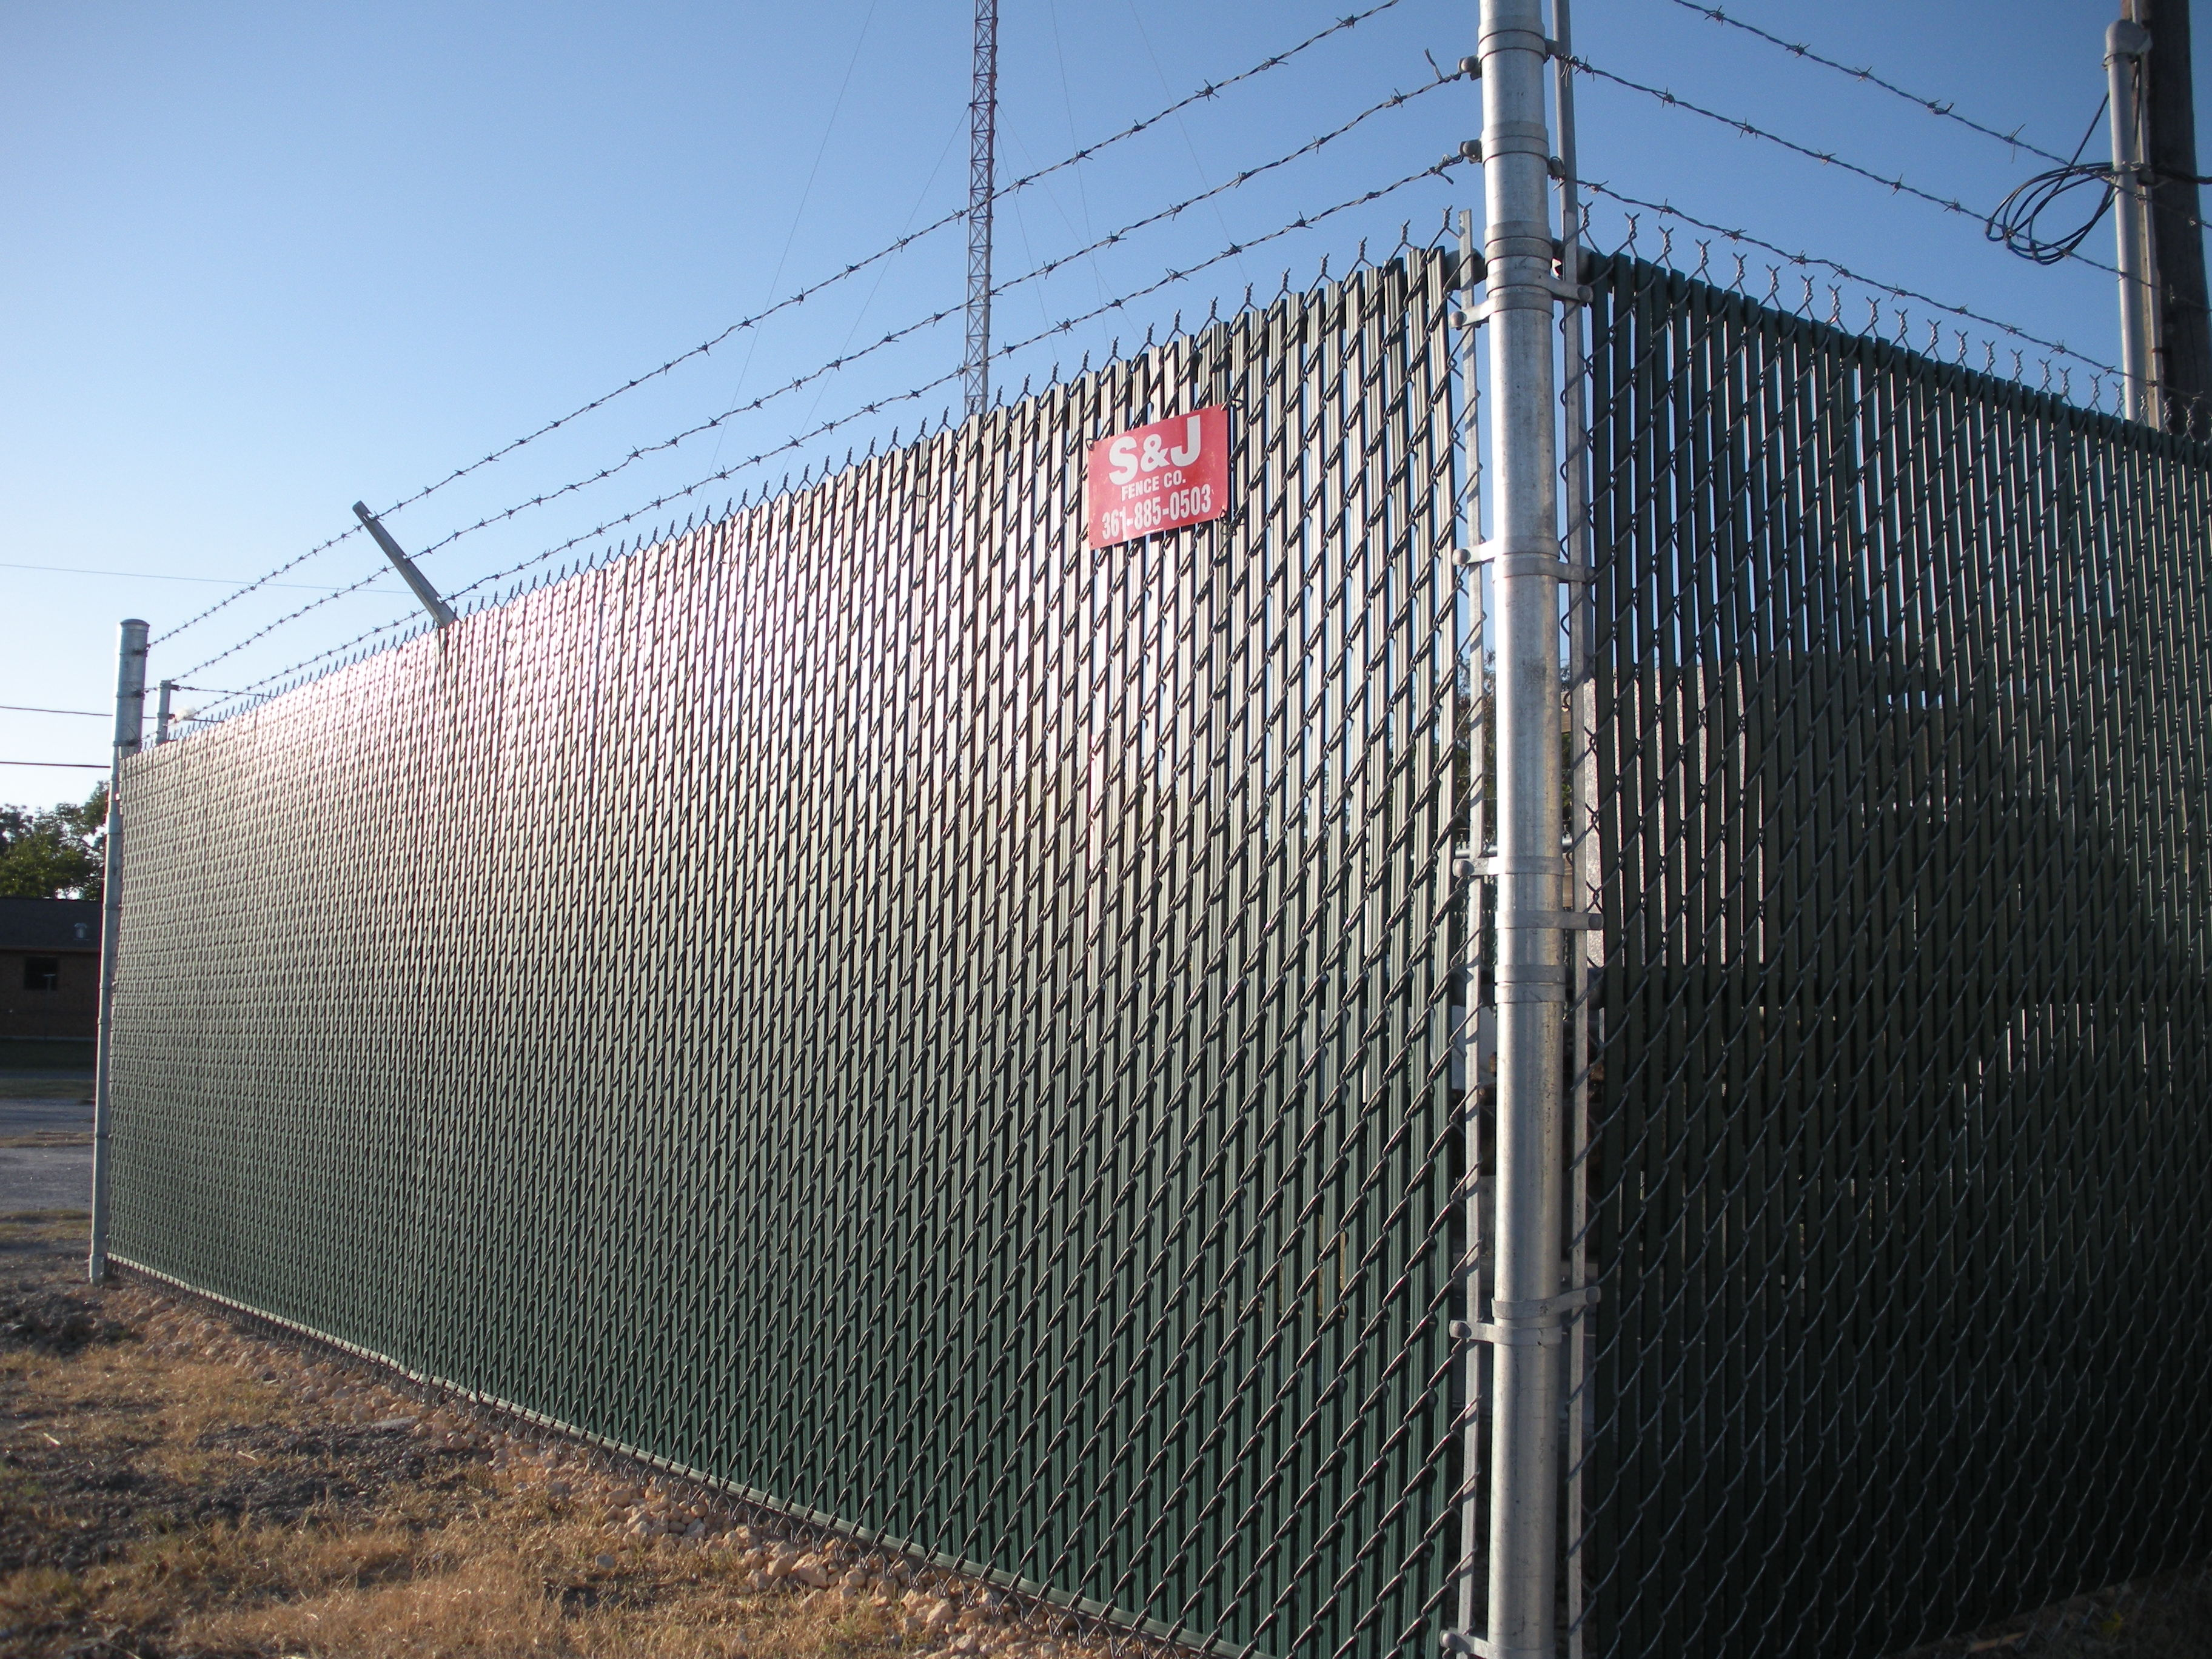 Corpus christi and gulf coast chain link security fence